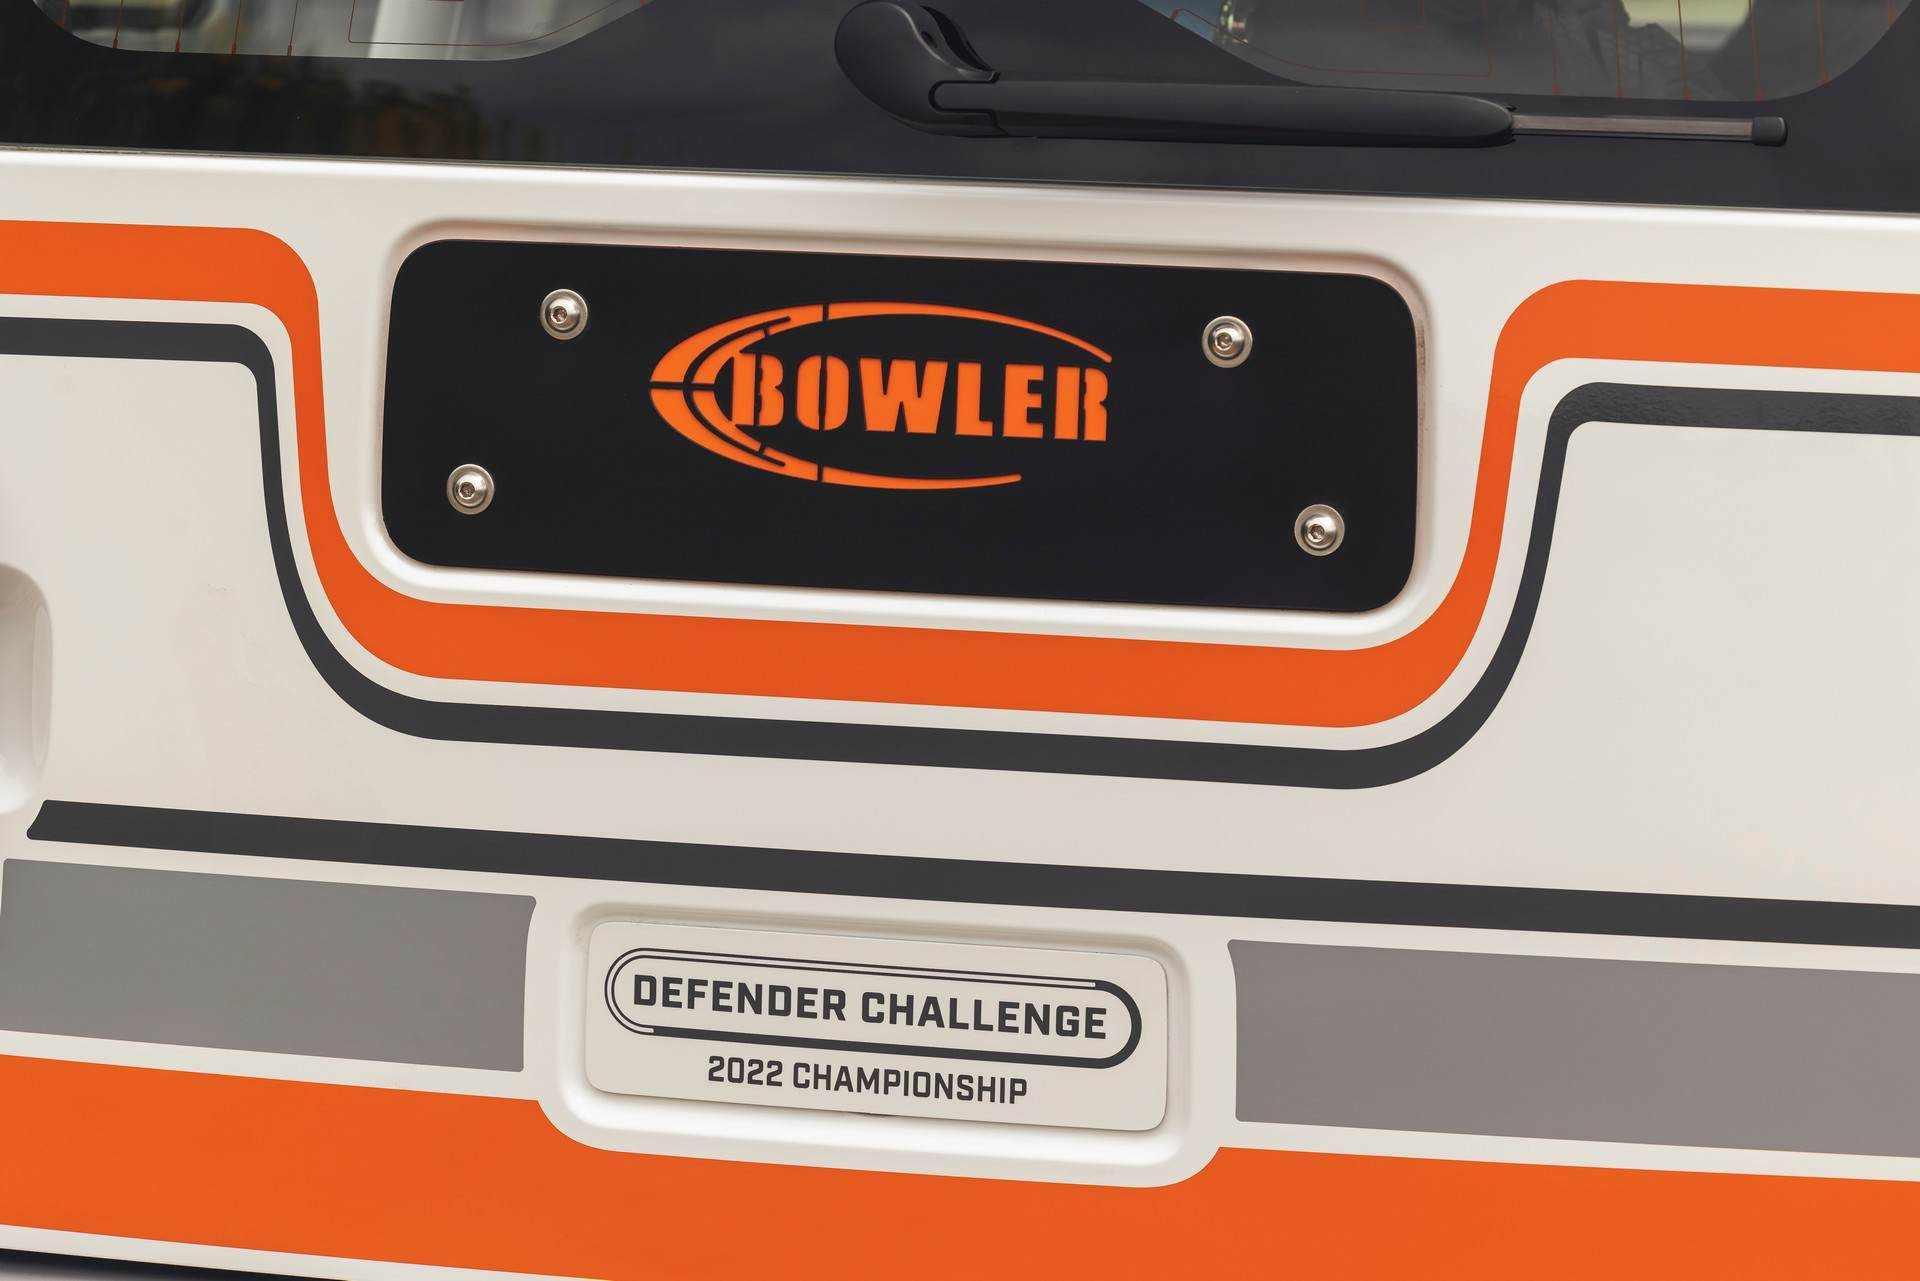 Bowler-Land-Rover-Defender-Challenge-Rally-Car-42